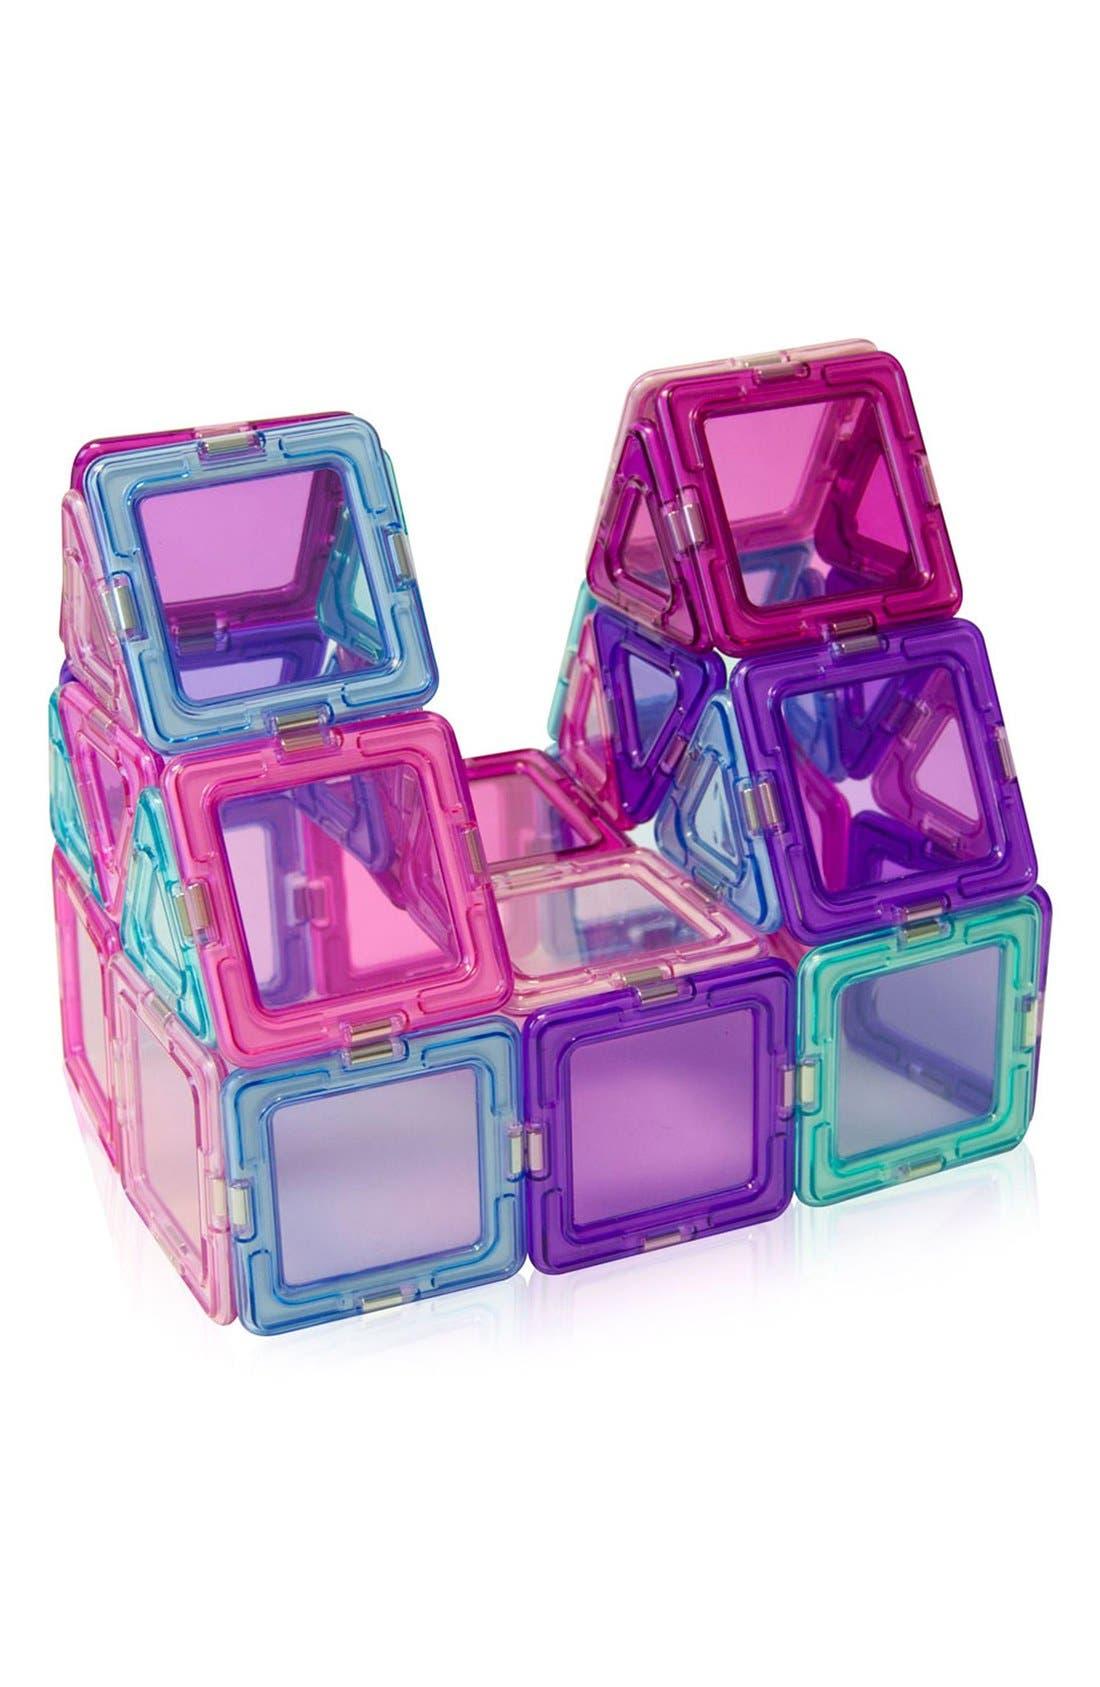 'Inspire - Solids' Clear Magnetic 3D Construction Set,                             Alternate thumbnail 6, color,                             440